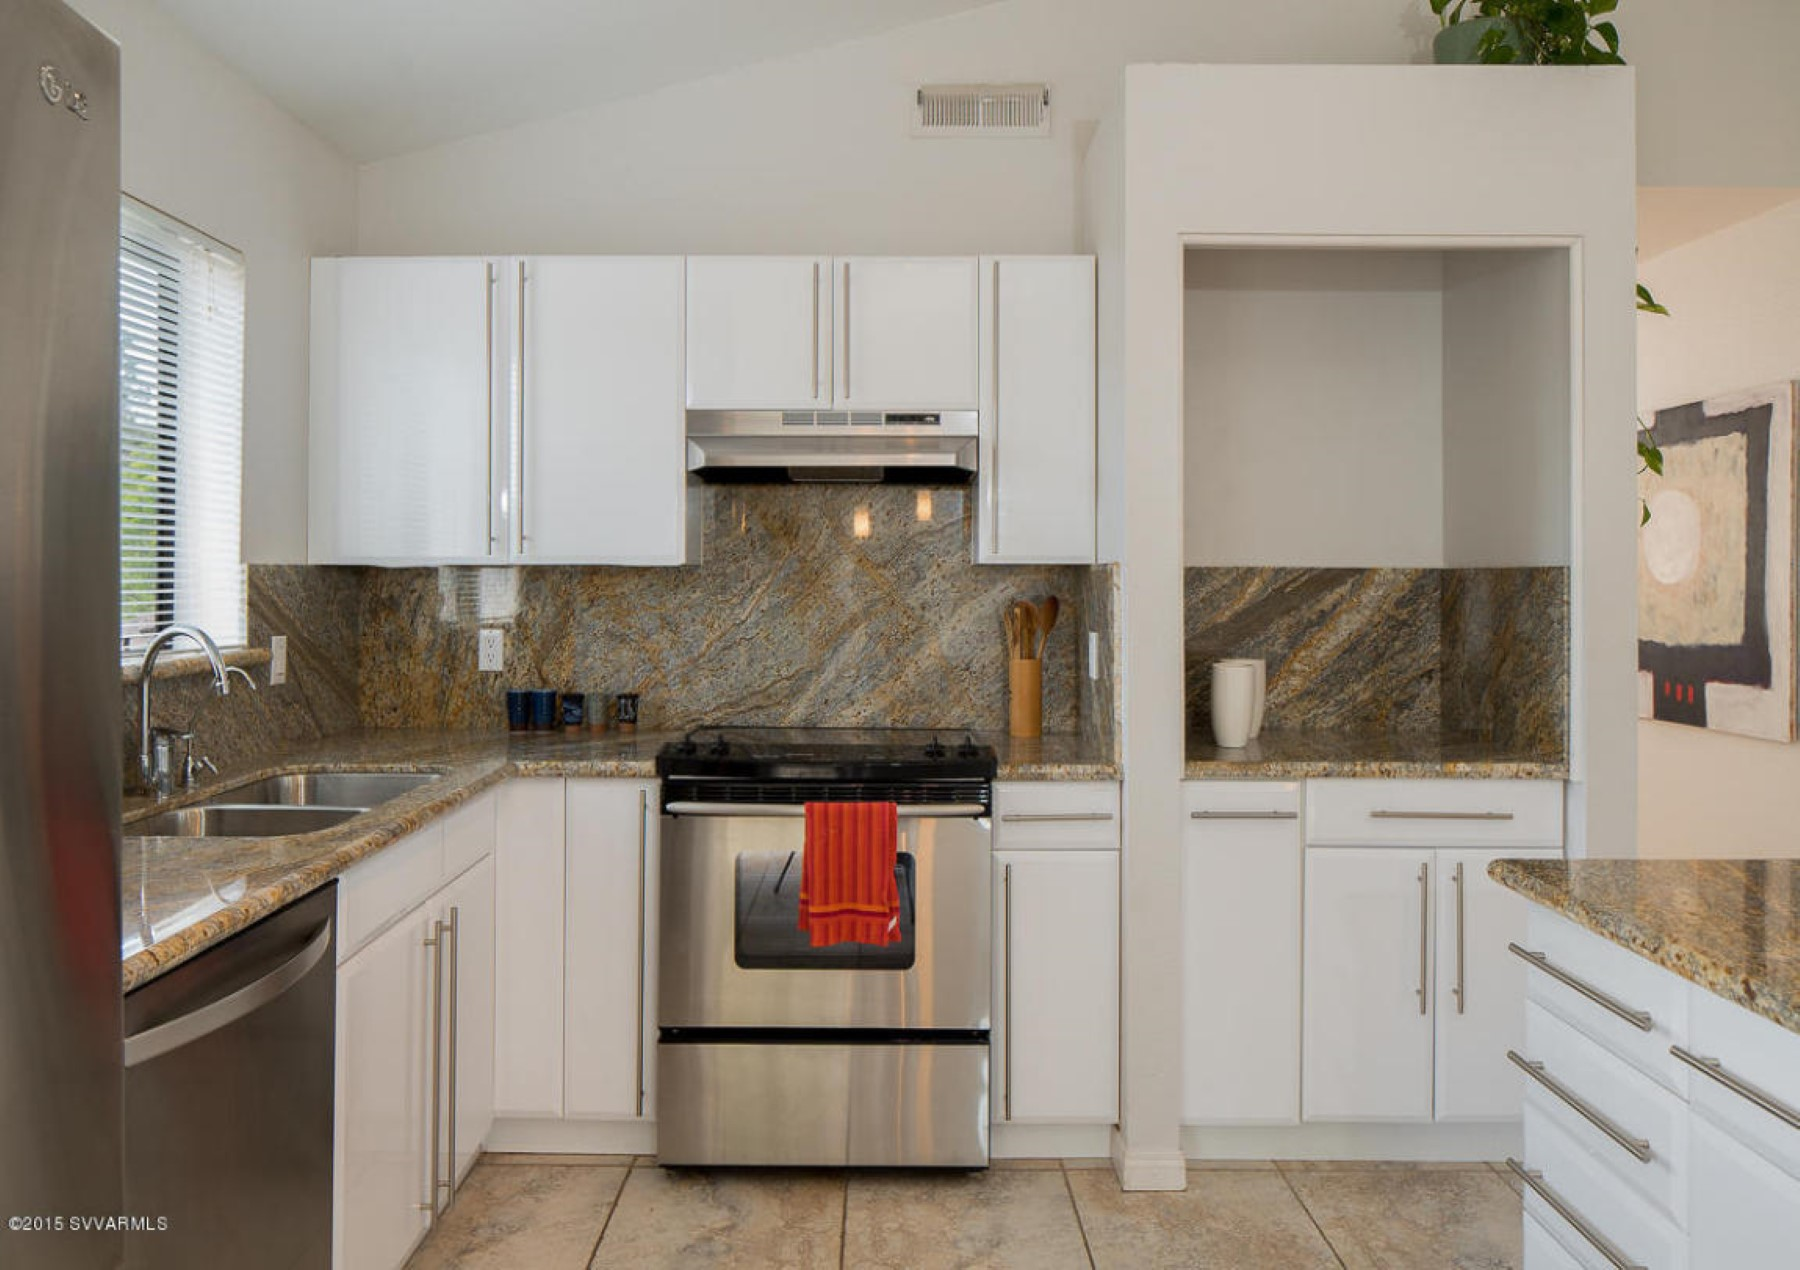 Tek Ailelik Ev için Satış at This home demonstrates Views, Freshness, and Elegance. 2350 Maxwell Sedona, Arizona 86336 Amerika Birleşik Devletleri